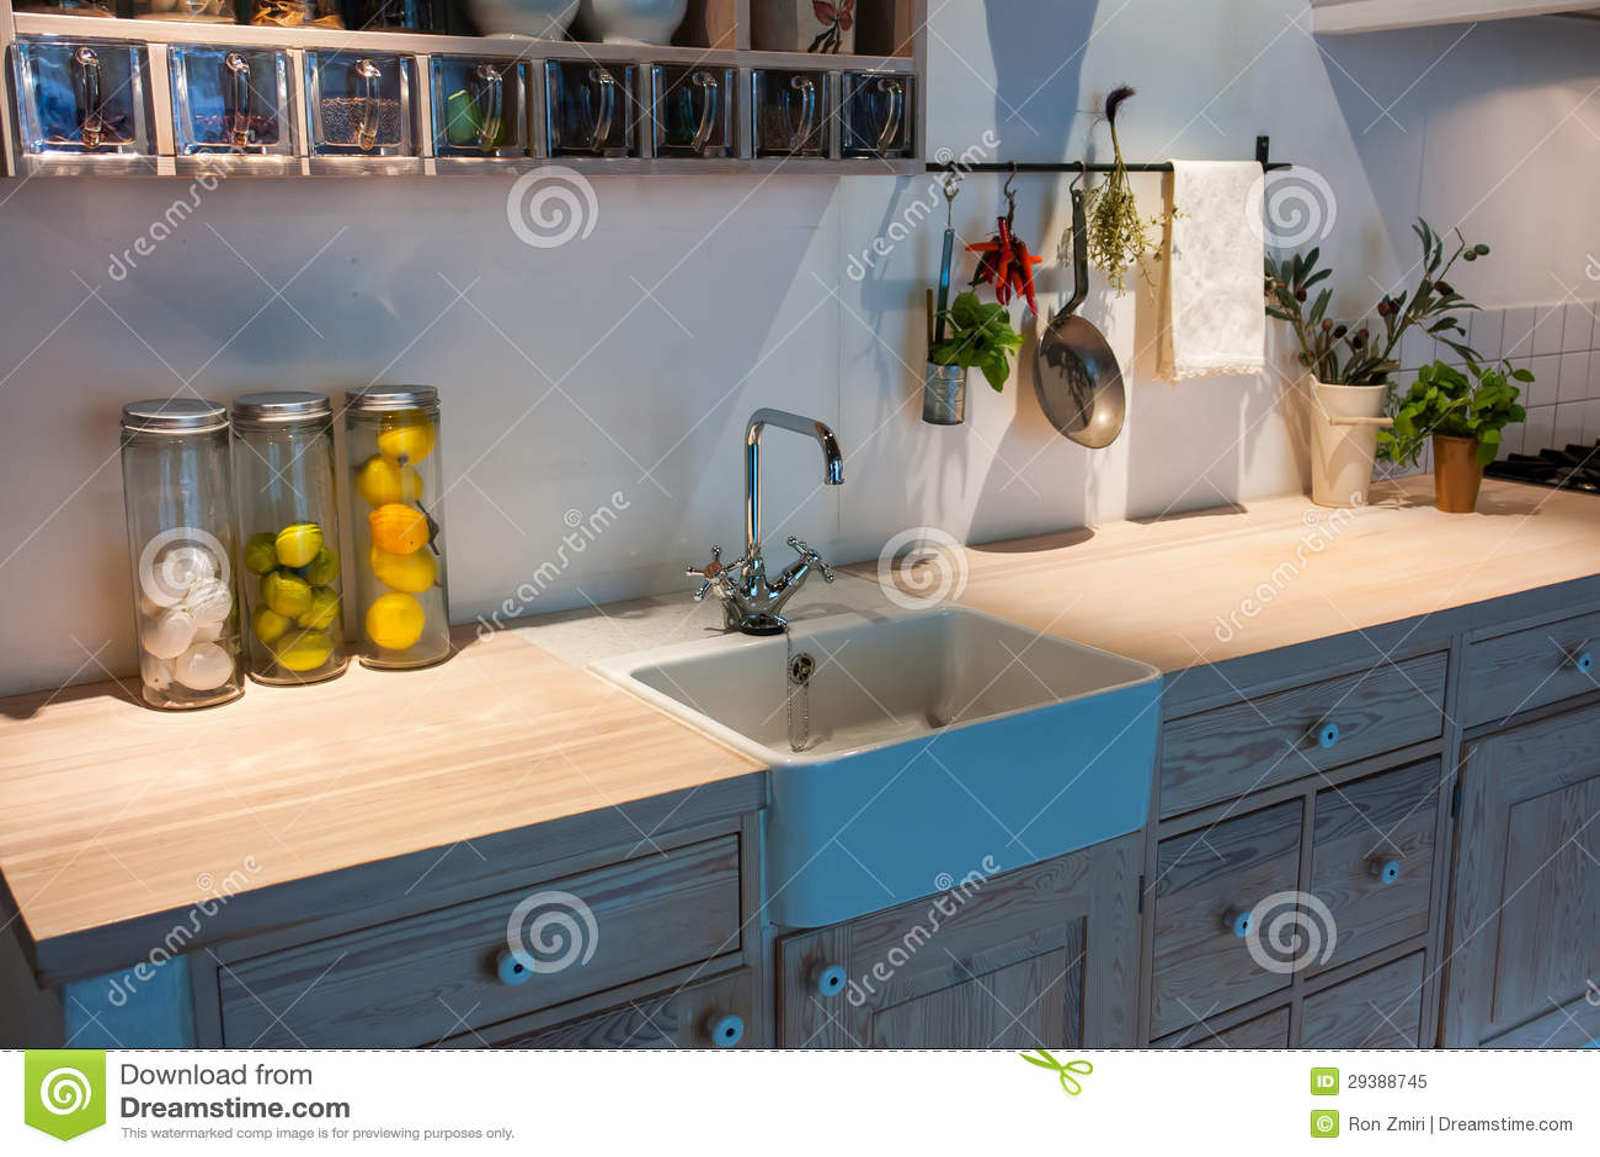 Excelente Diseños De Cocina Modernos País Ornamento - Ideas Del ...